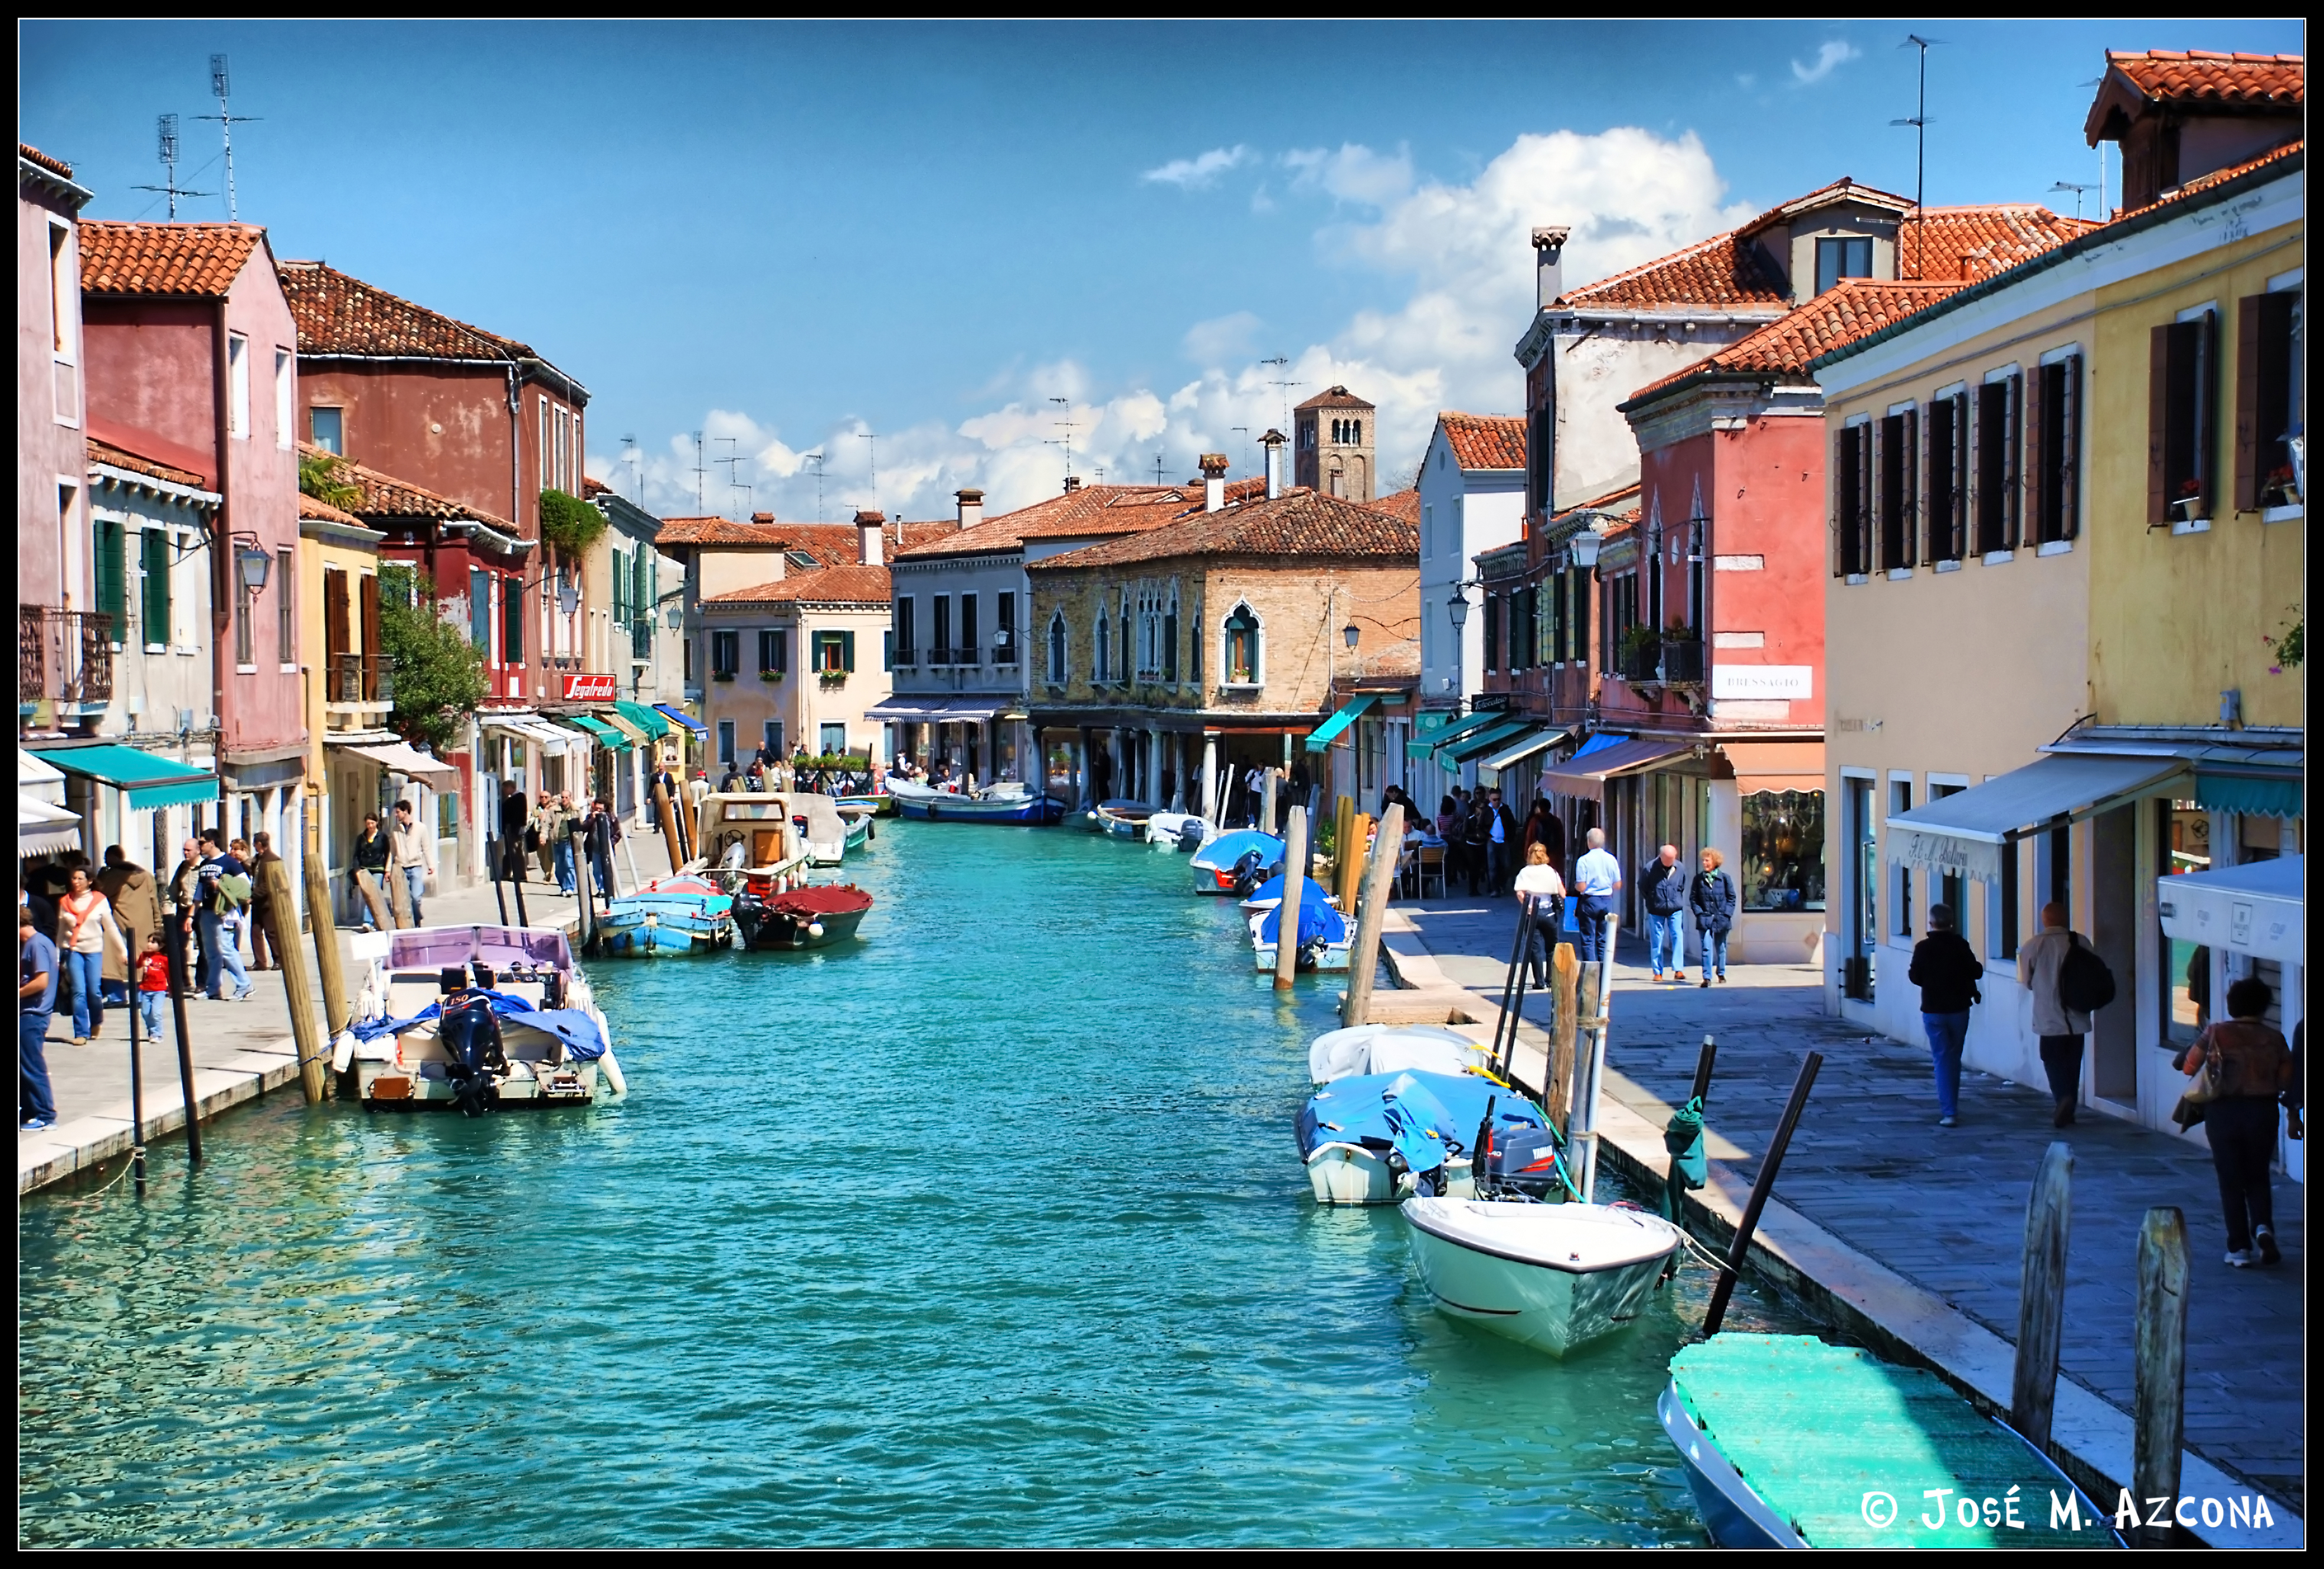 Venecia italia isla de murano flickr photo sharing - Murano bilder ...